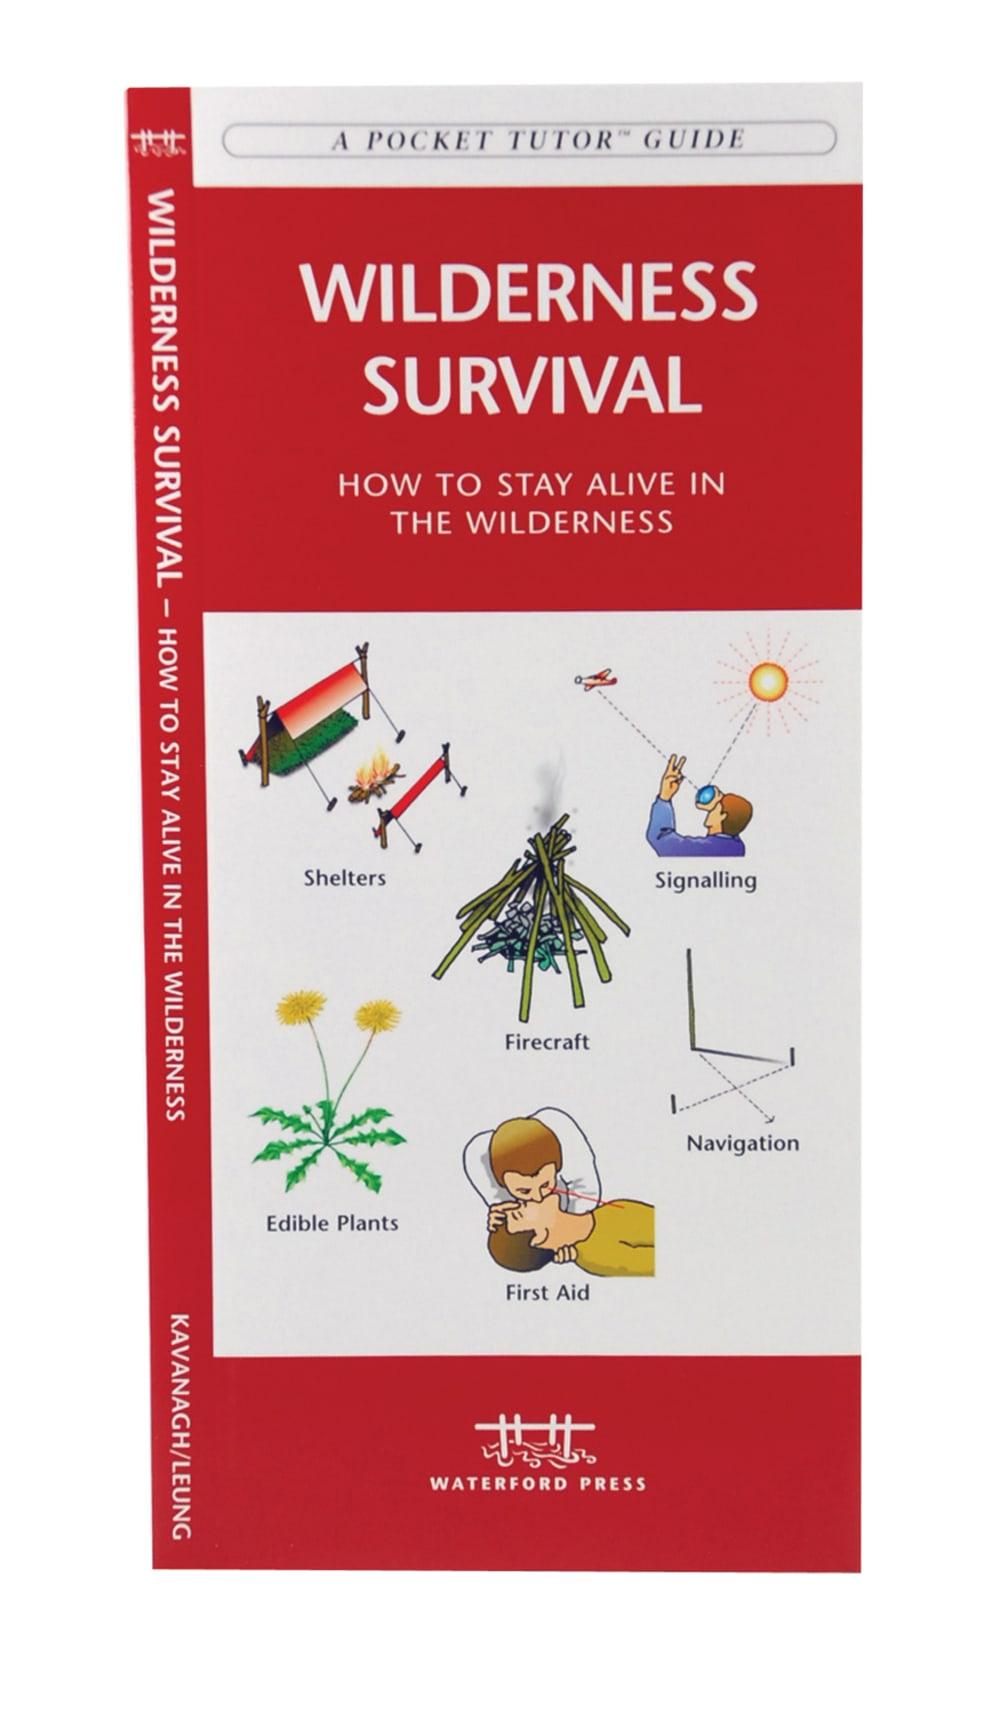 Wilderness Survival Pocket Guide - NONE